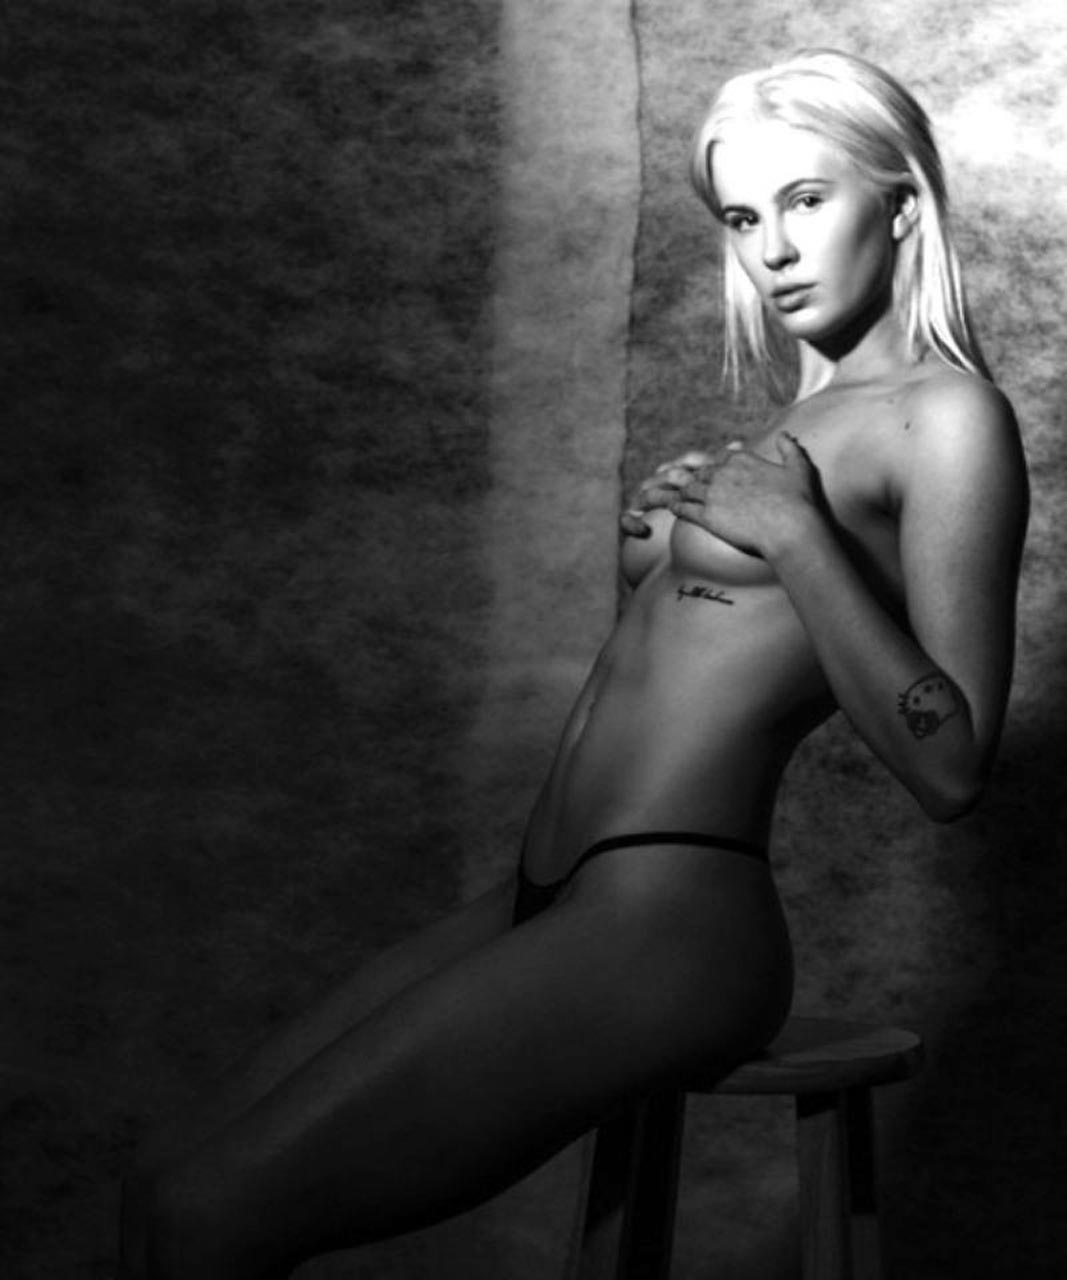 Nicki minaj jerk off challenge - 3 part 3